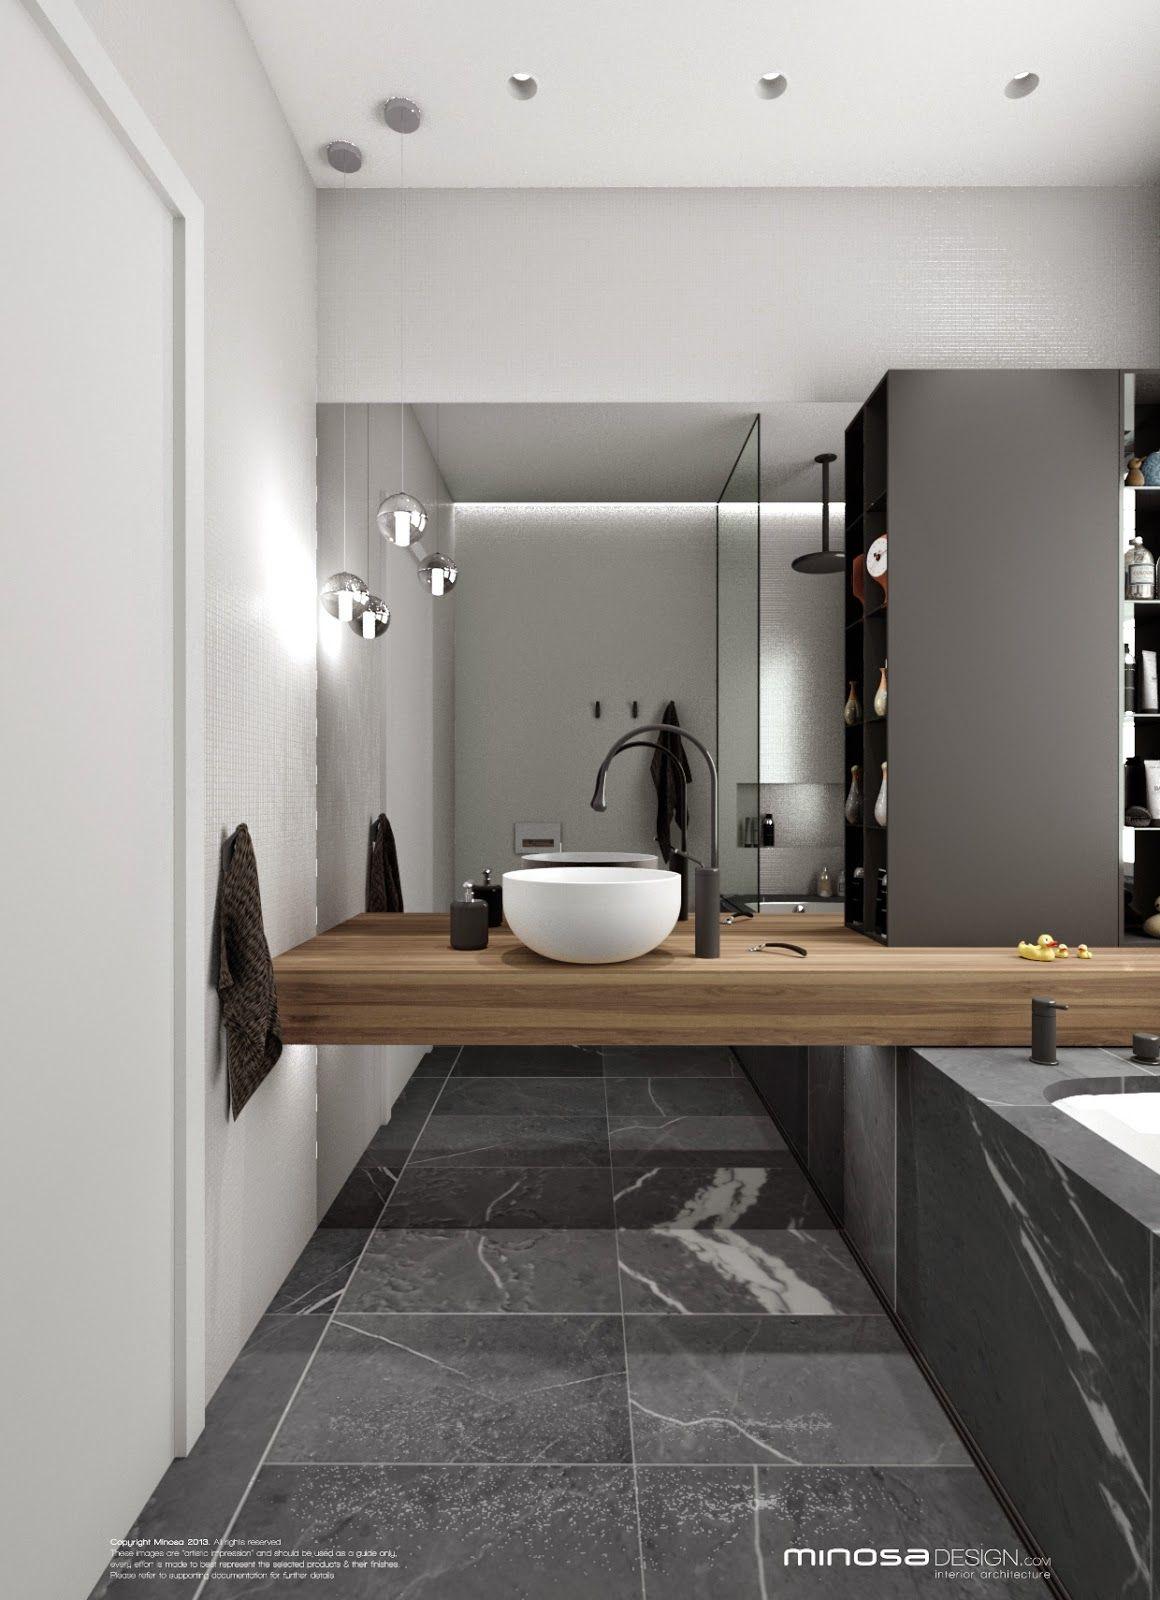 Guest Bathroom Downstairs Design!! Minosa Design: Bathroom Design   Small  Space Feels Large